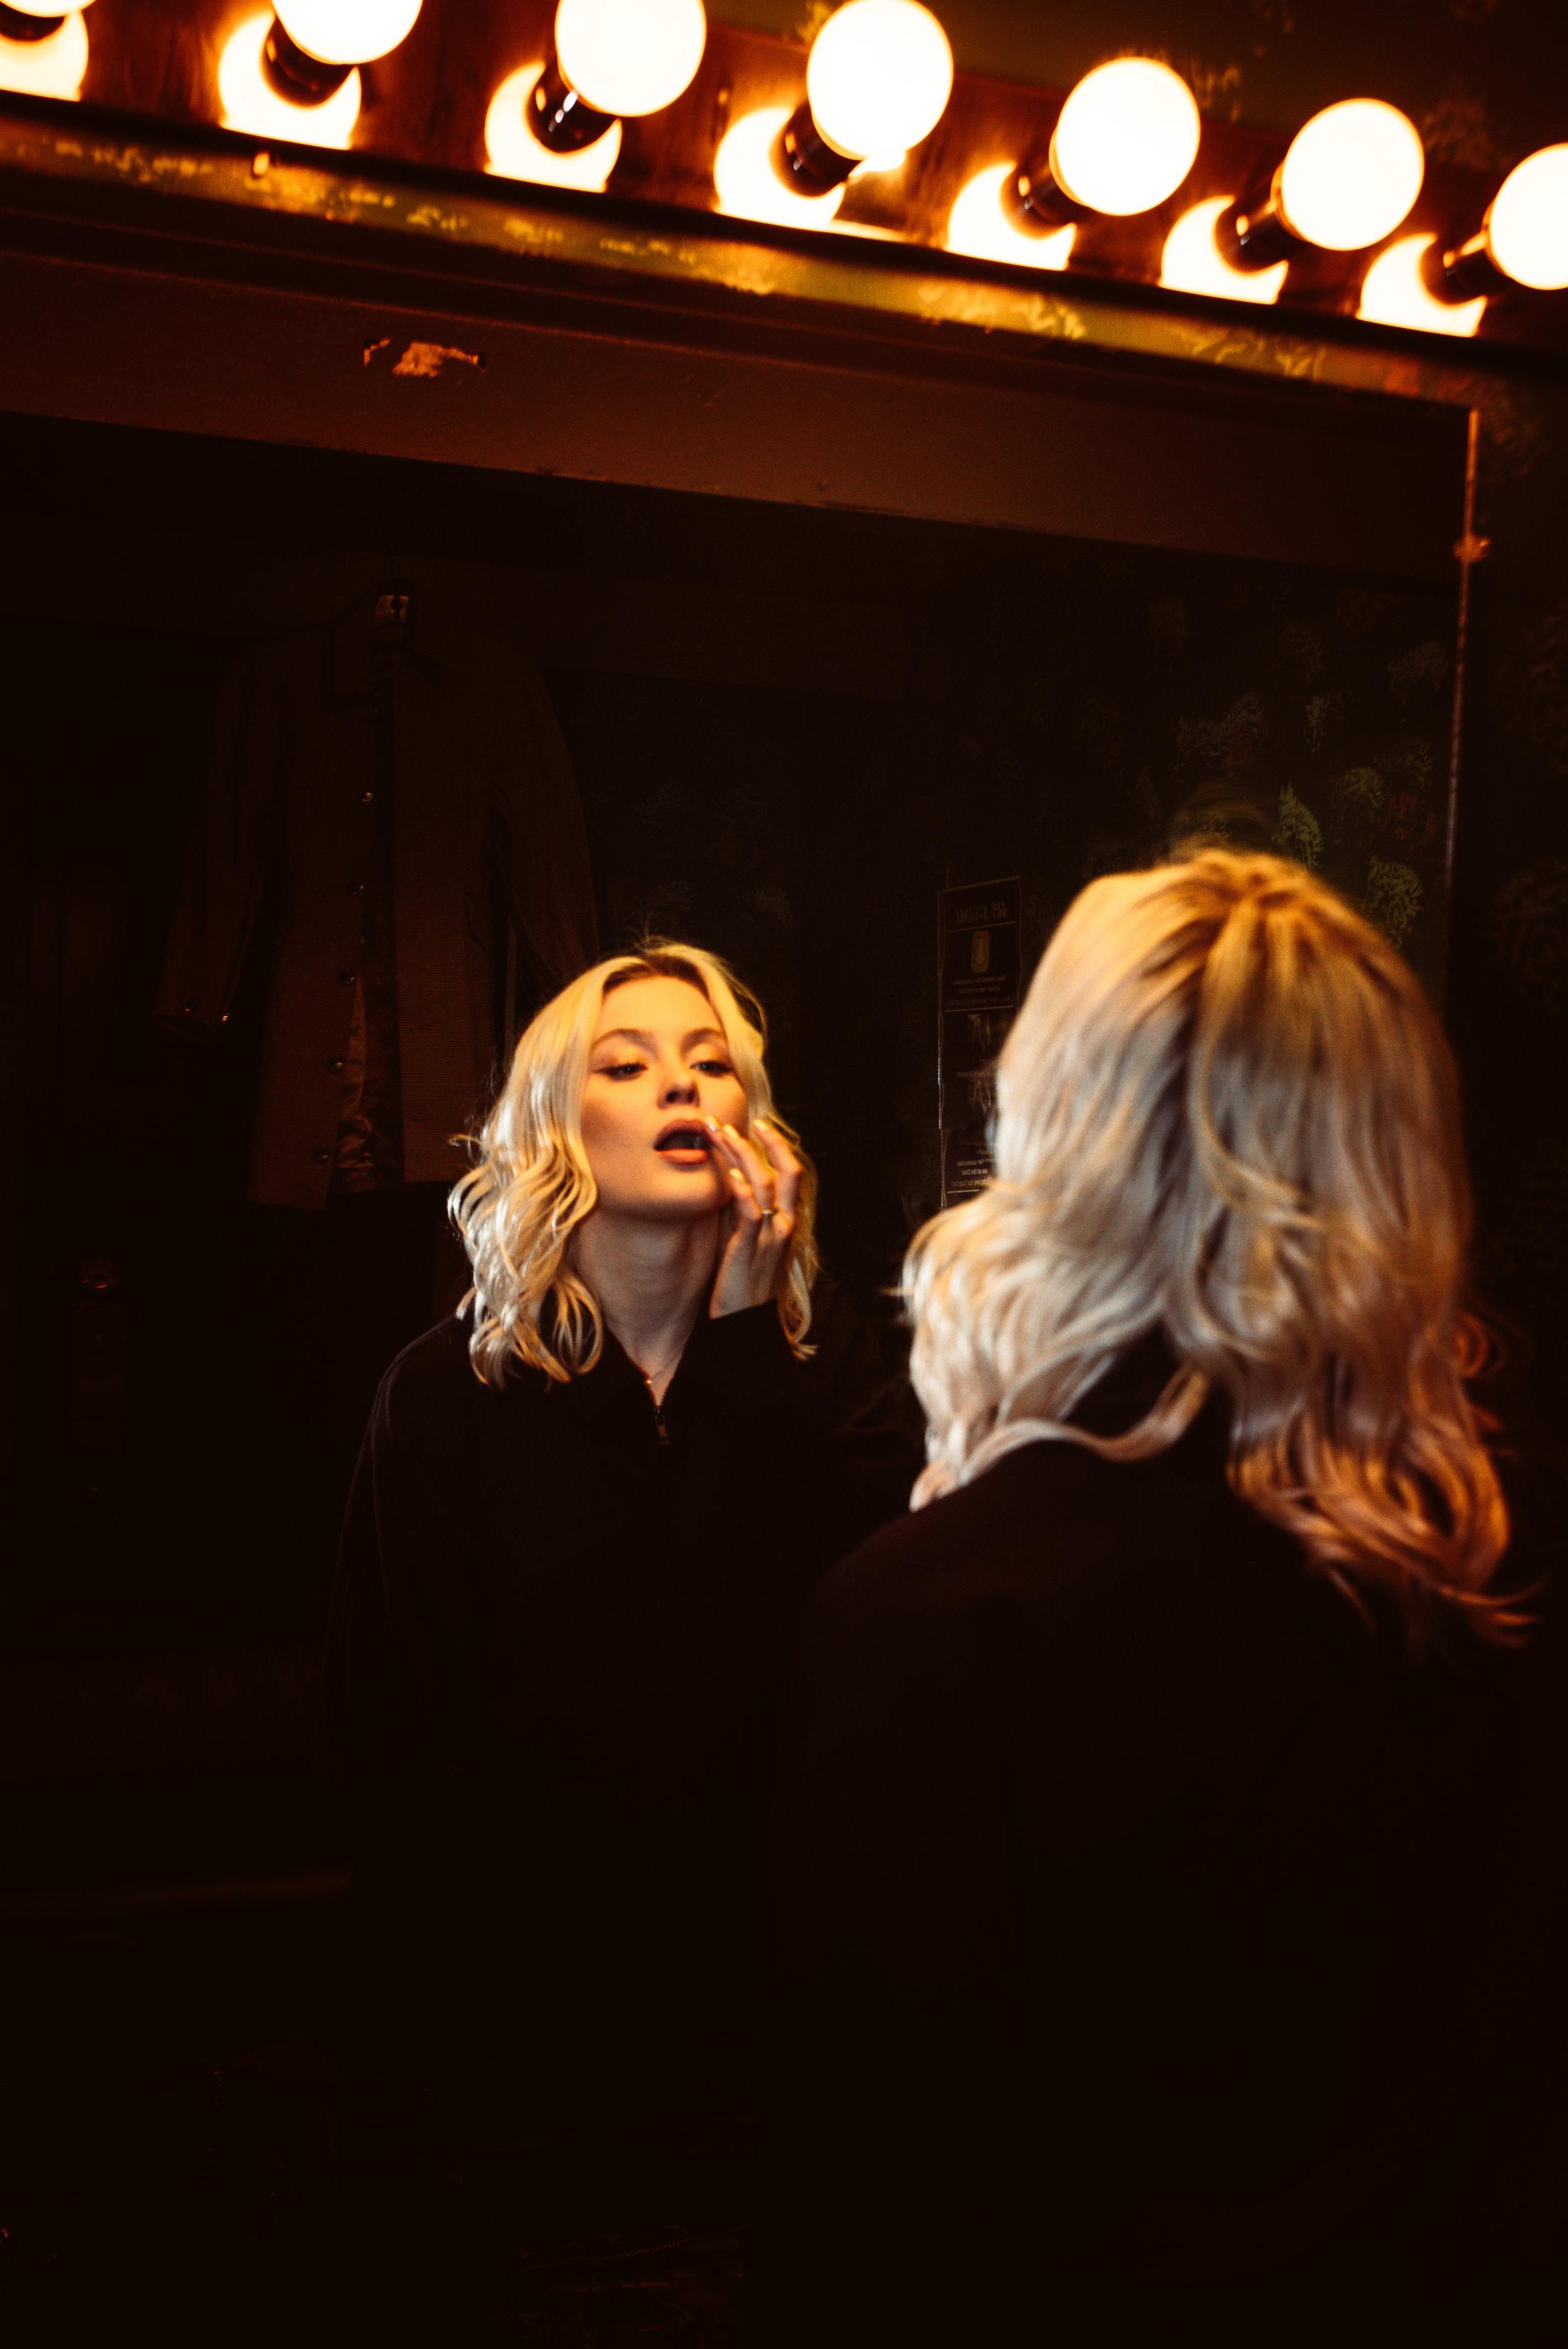 Zara Larsson - 05-11-2019 - Raelena Kniff Media-6.jpg